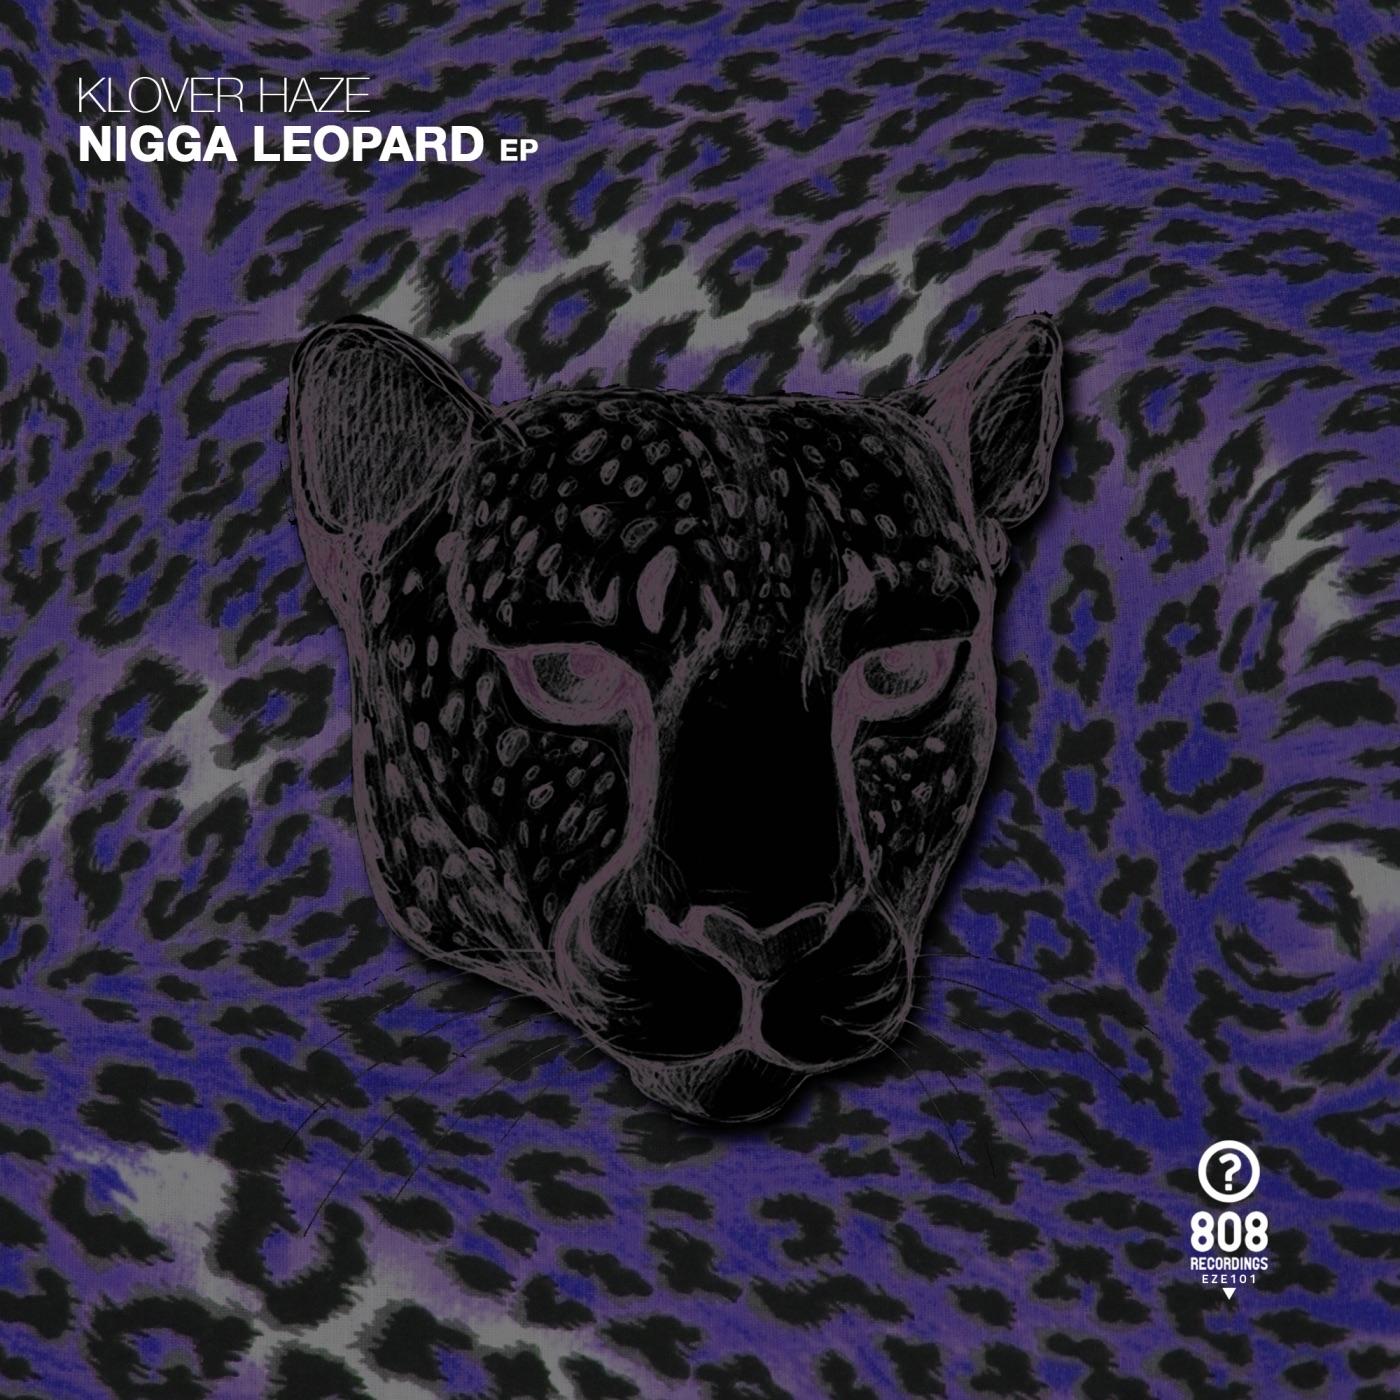 N***a Leopard EP